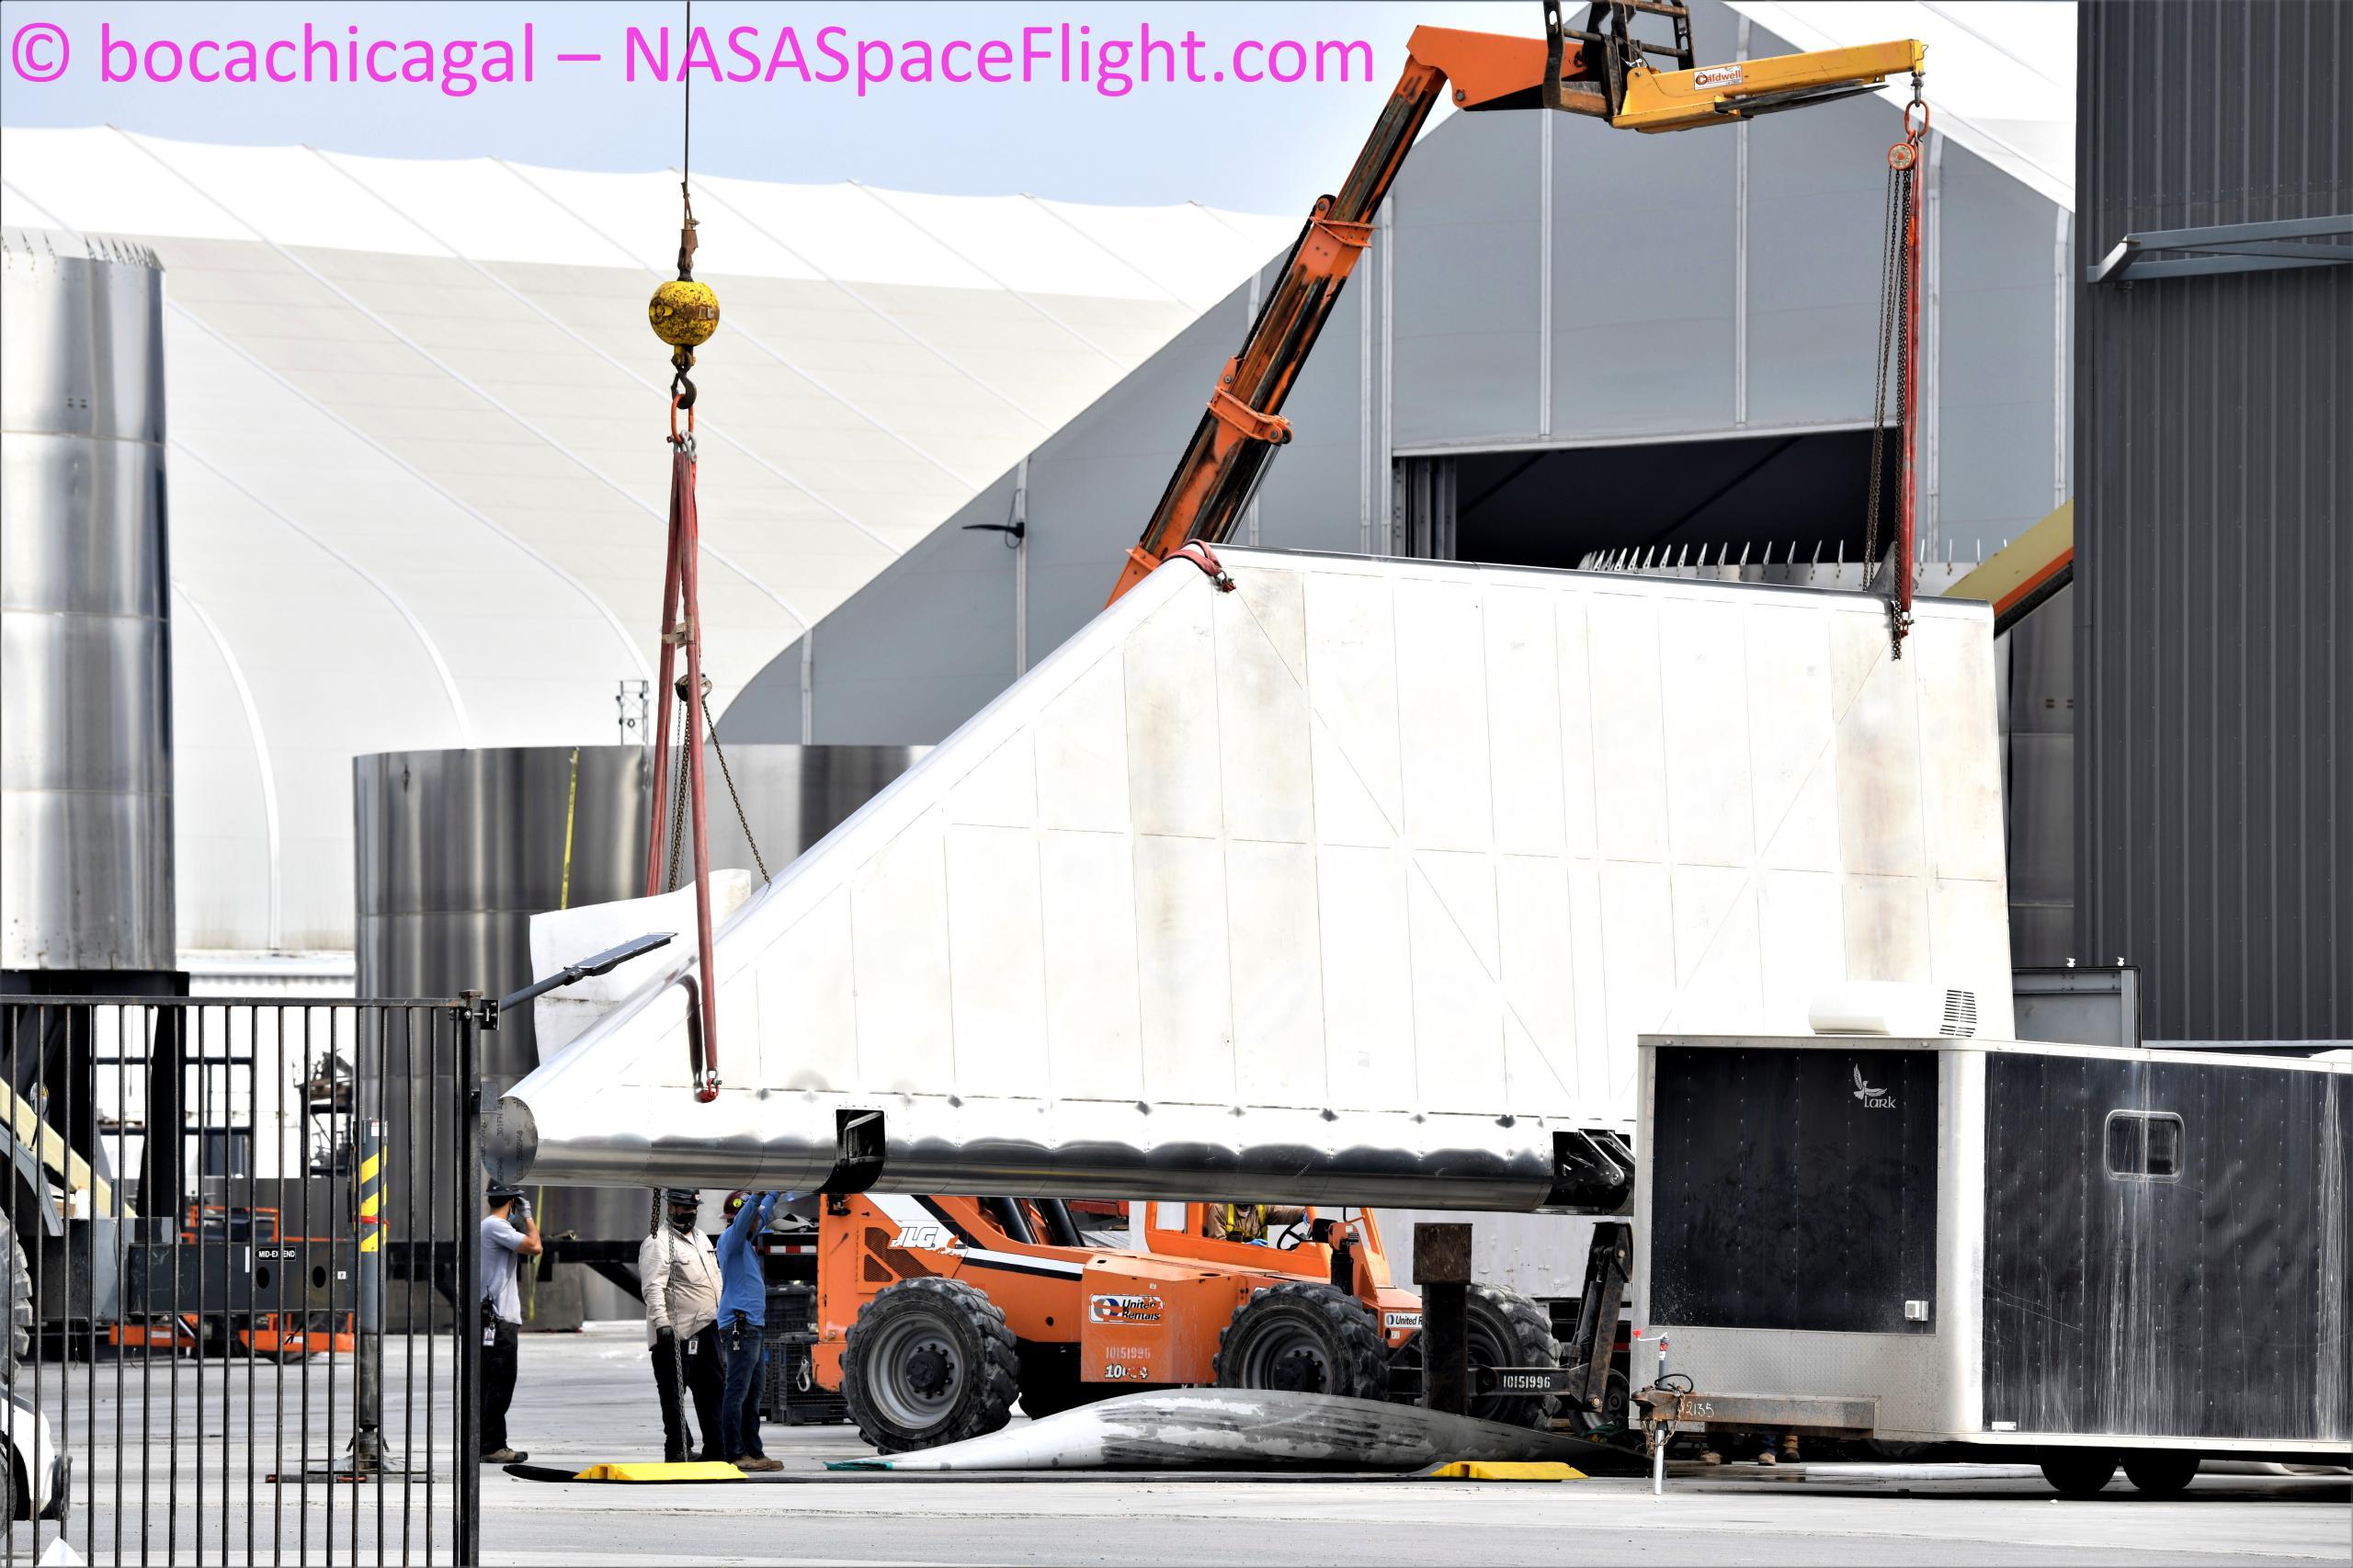 Starship Boca Chica 033121 (NASASpaceflight – bocachicagal) SN15 aft flap install 4 (c)